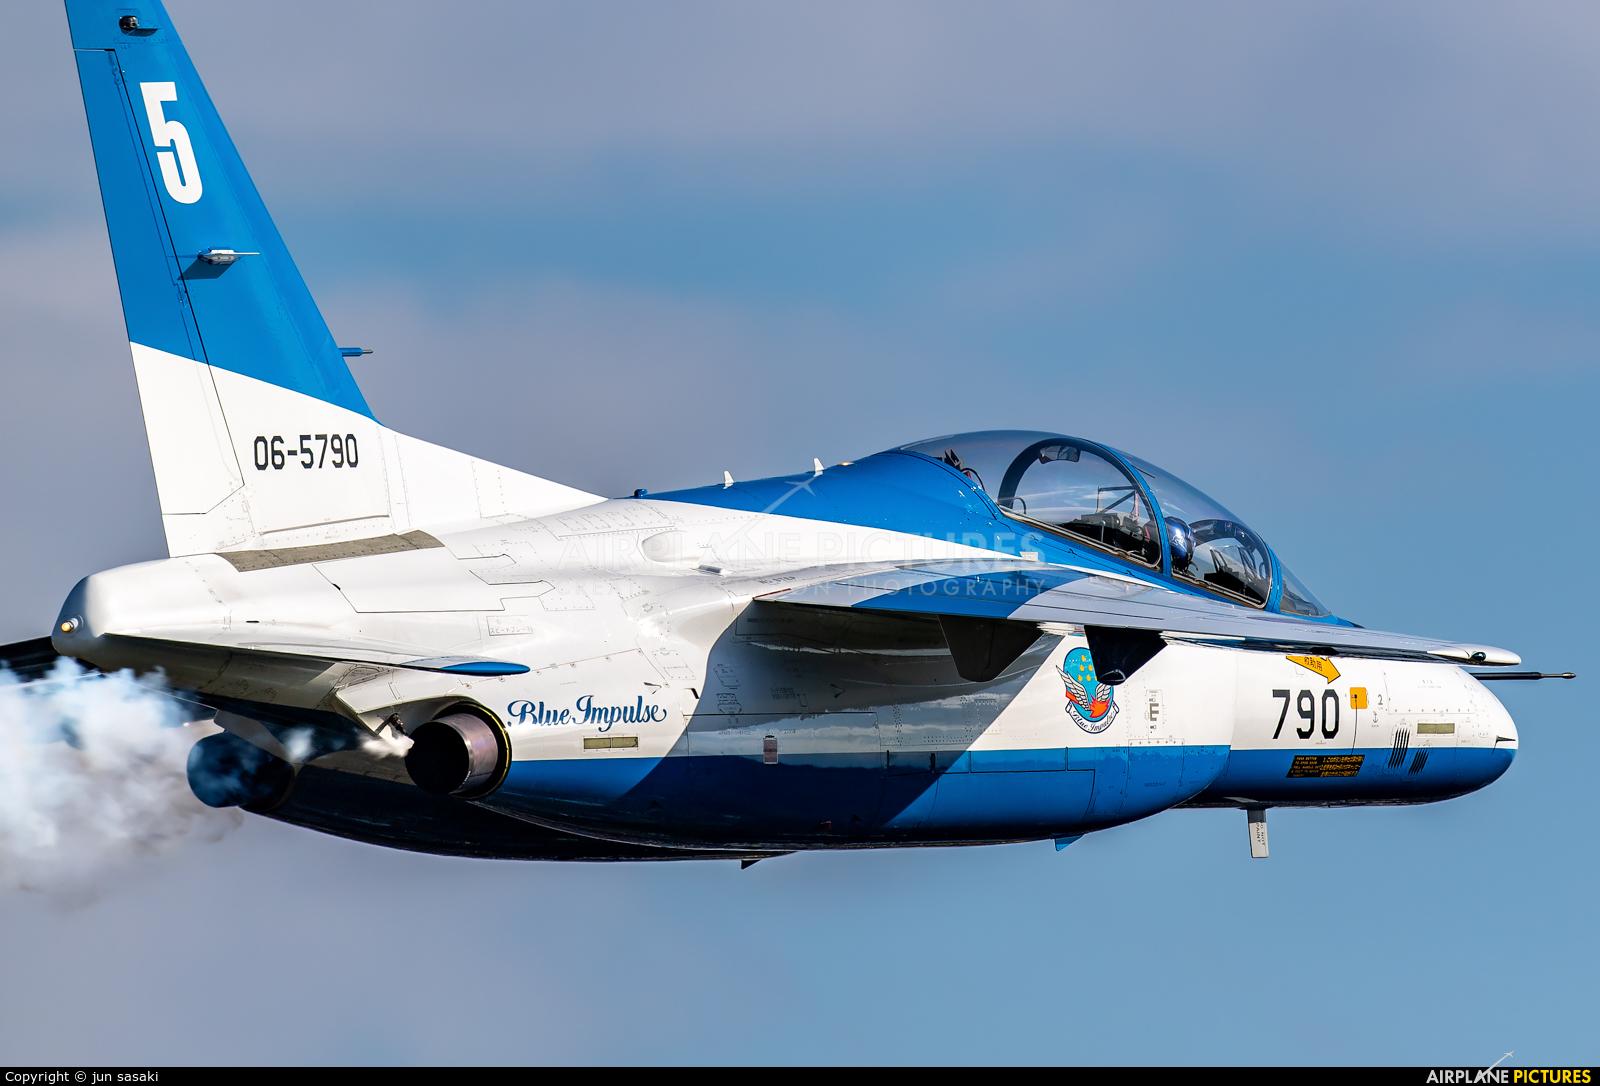 Japan - ASDF: Blue Impulse 06-5790 aircraft at Iruma AB